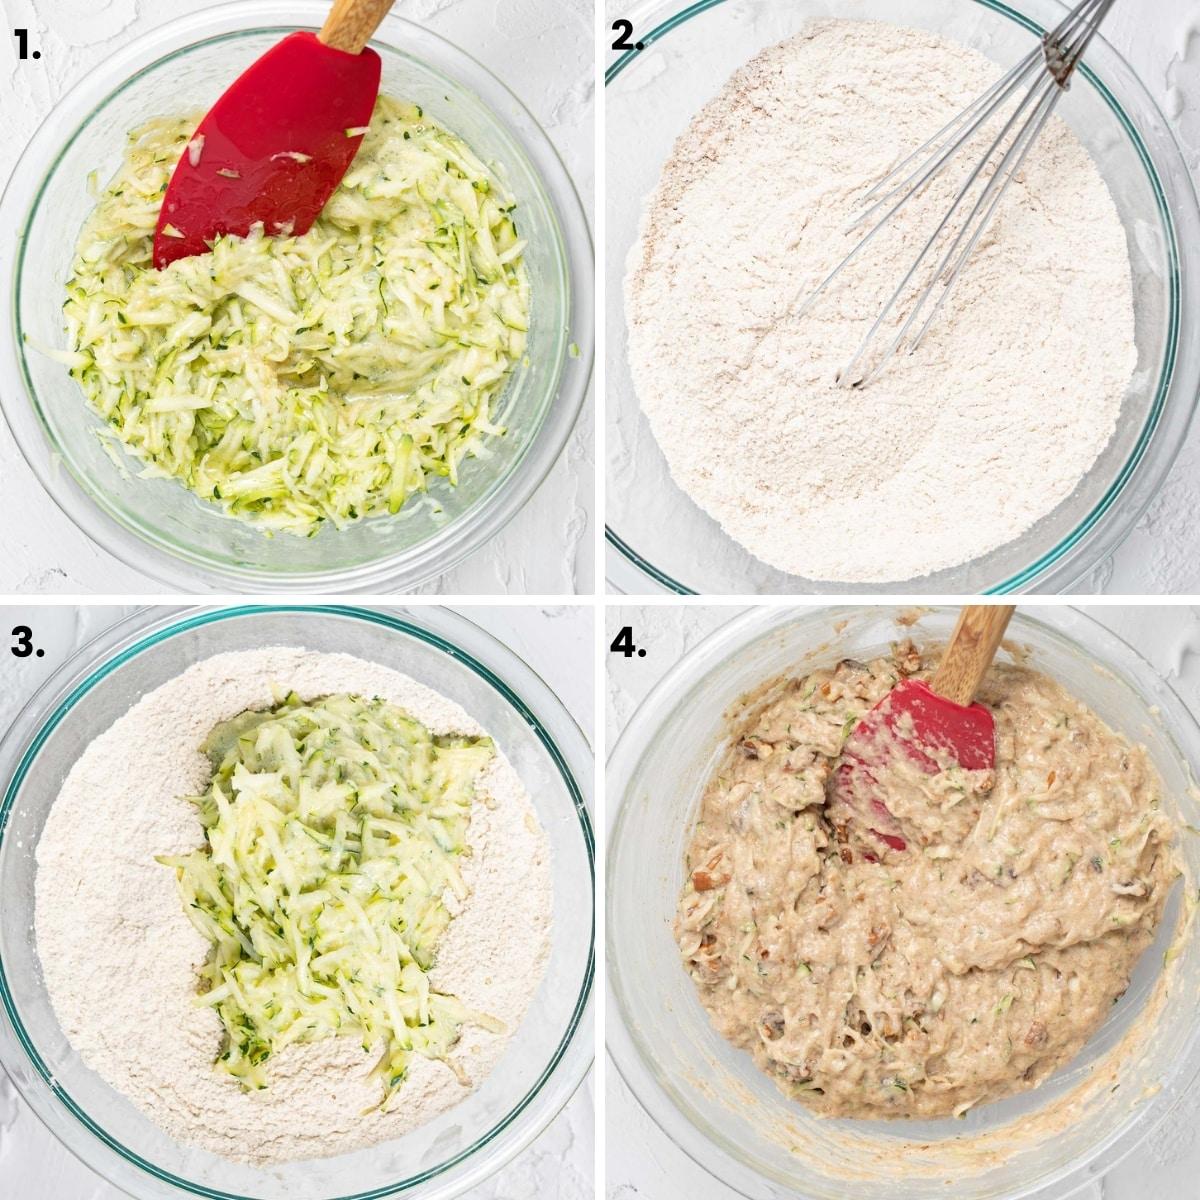 recipe process photos as per written recipe